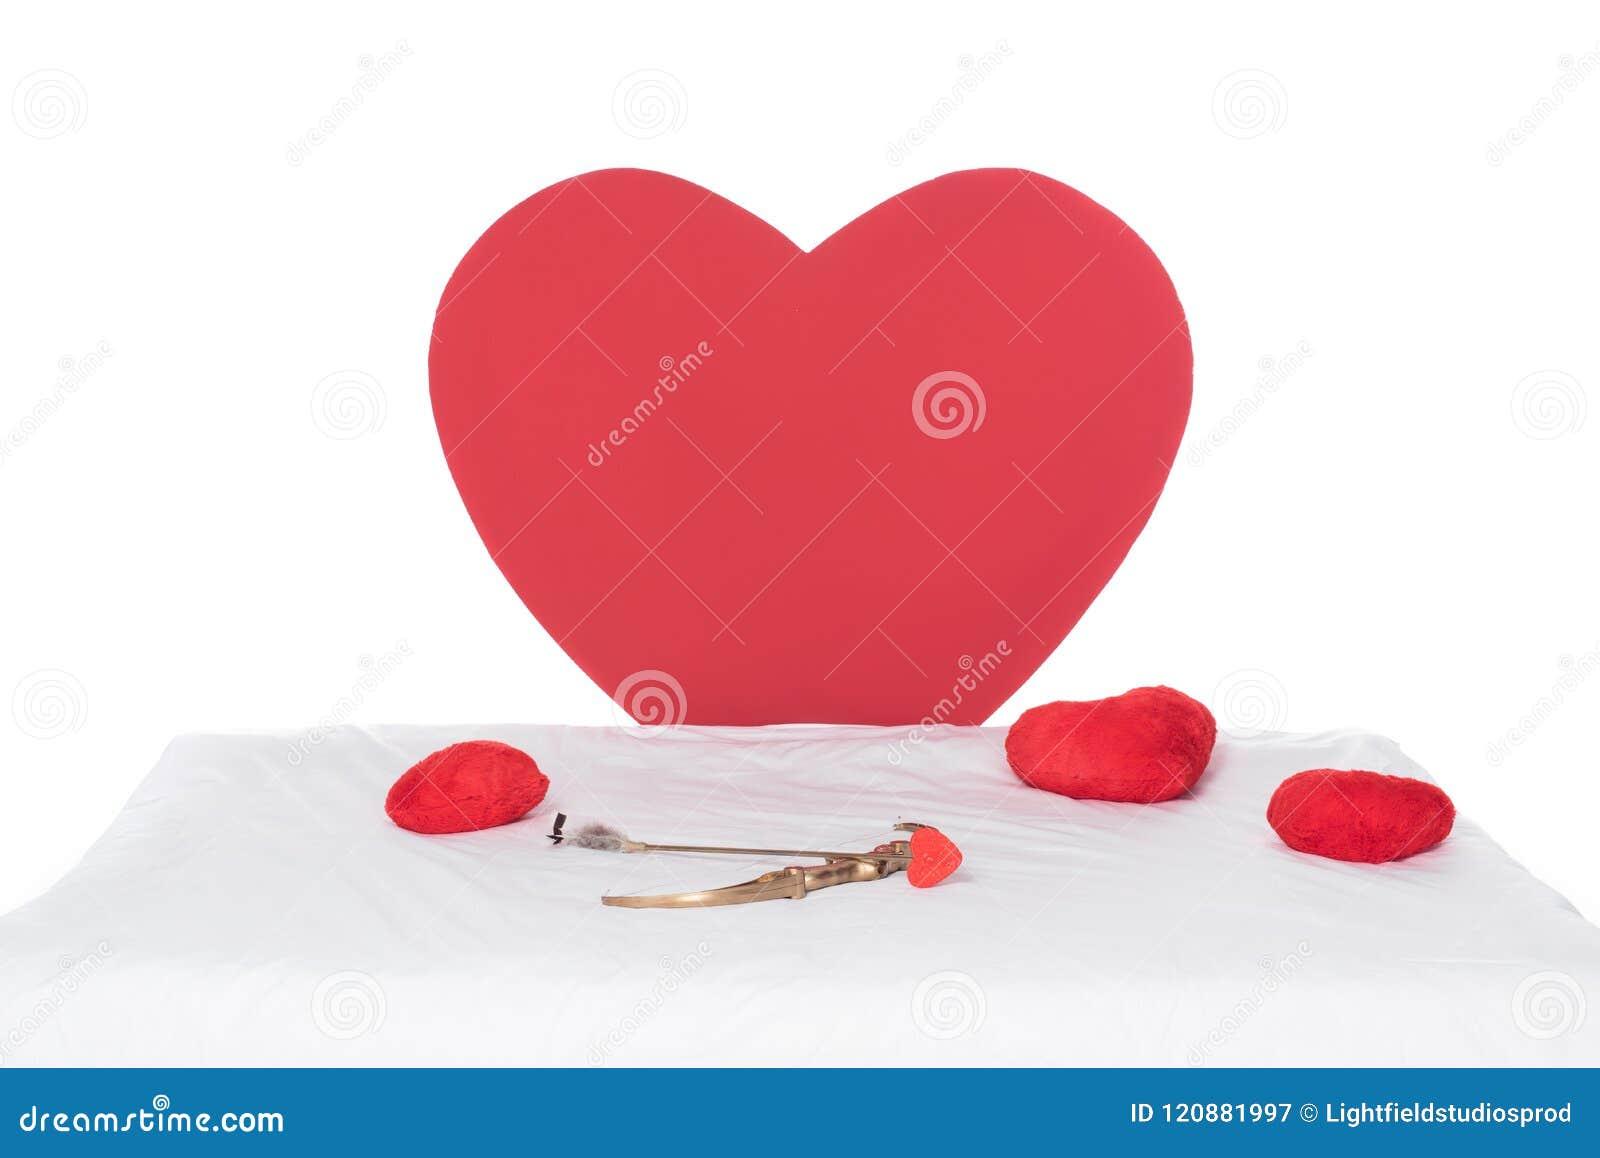 подушки сердца, крыла, лук и стрелы